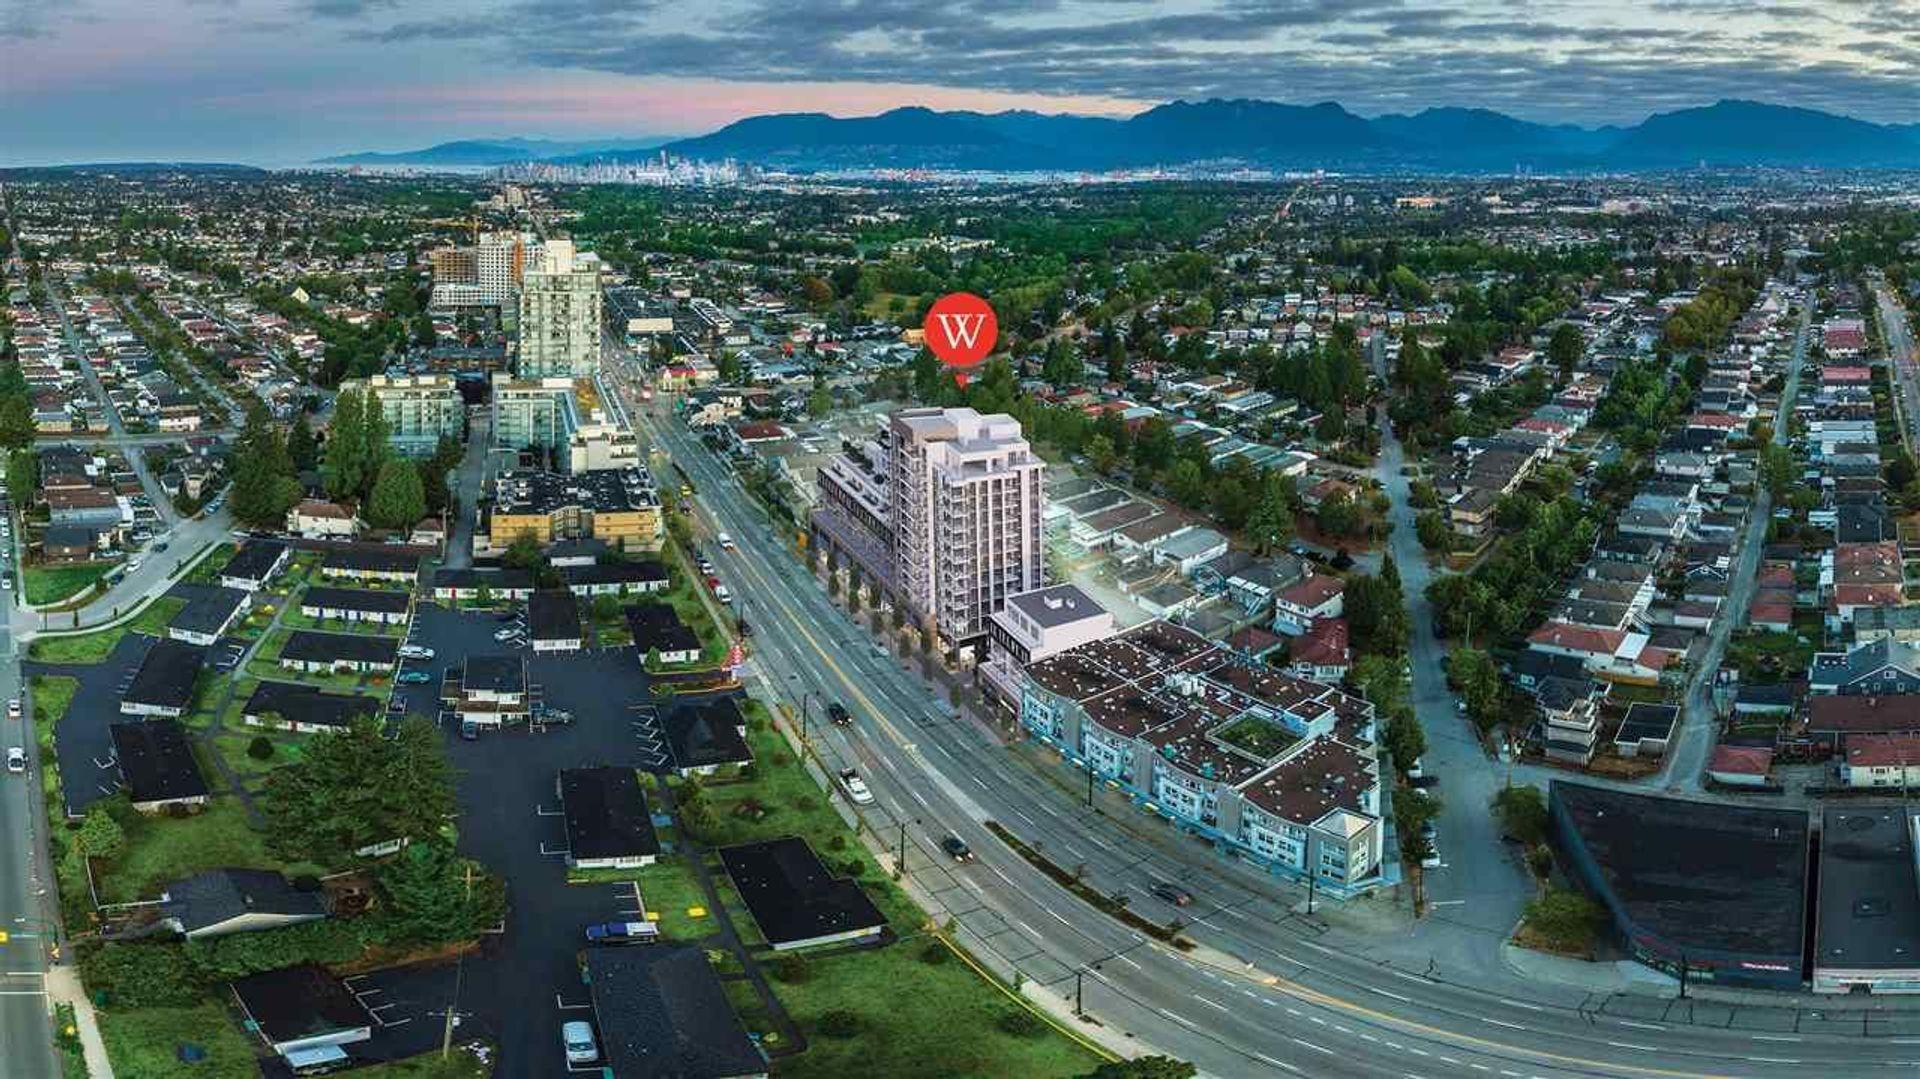 2435-kingsway-collingwood-ve-vancouver-east-08 at 1205 - 2435 Kingsway, Collingwood VE, Vancouver East